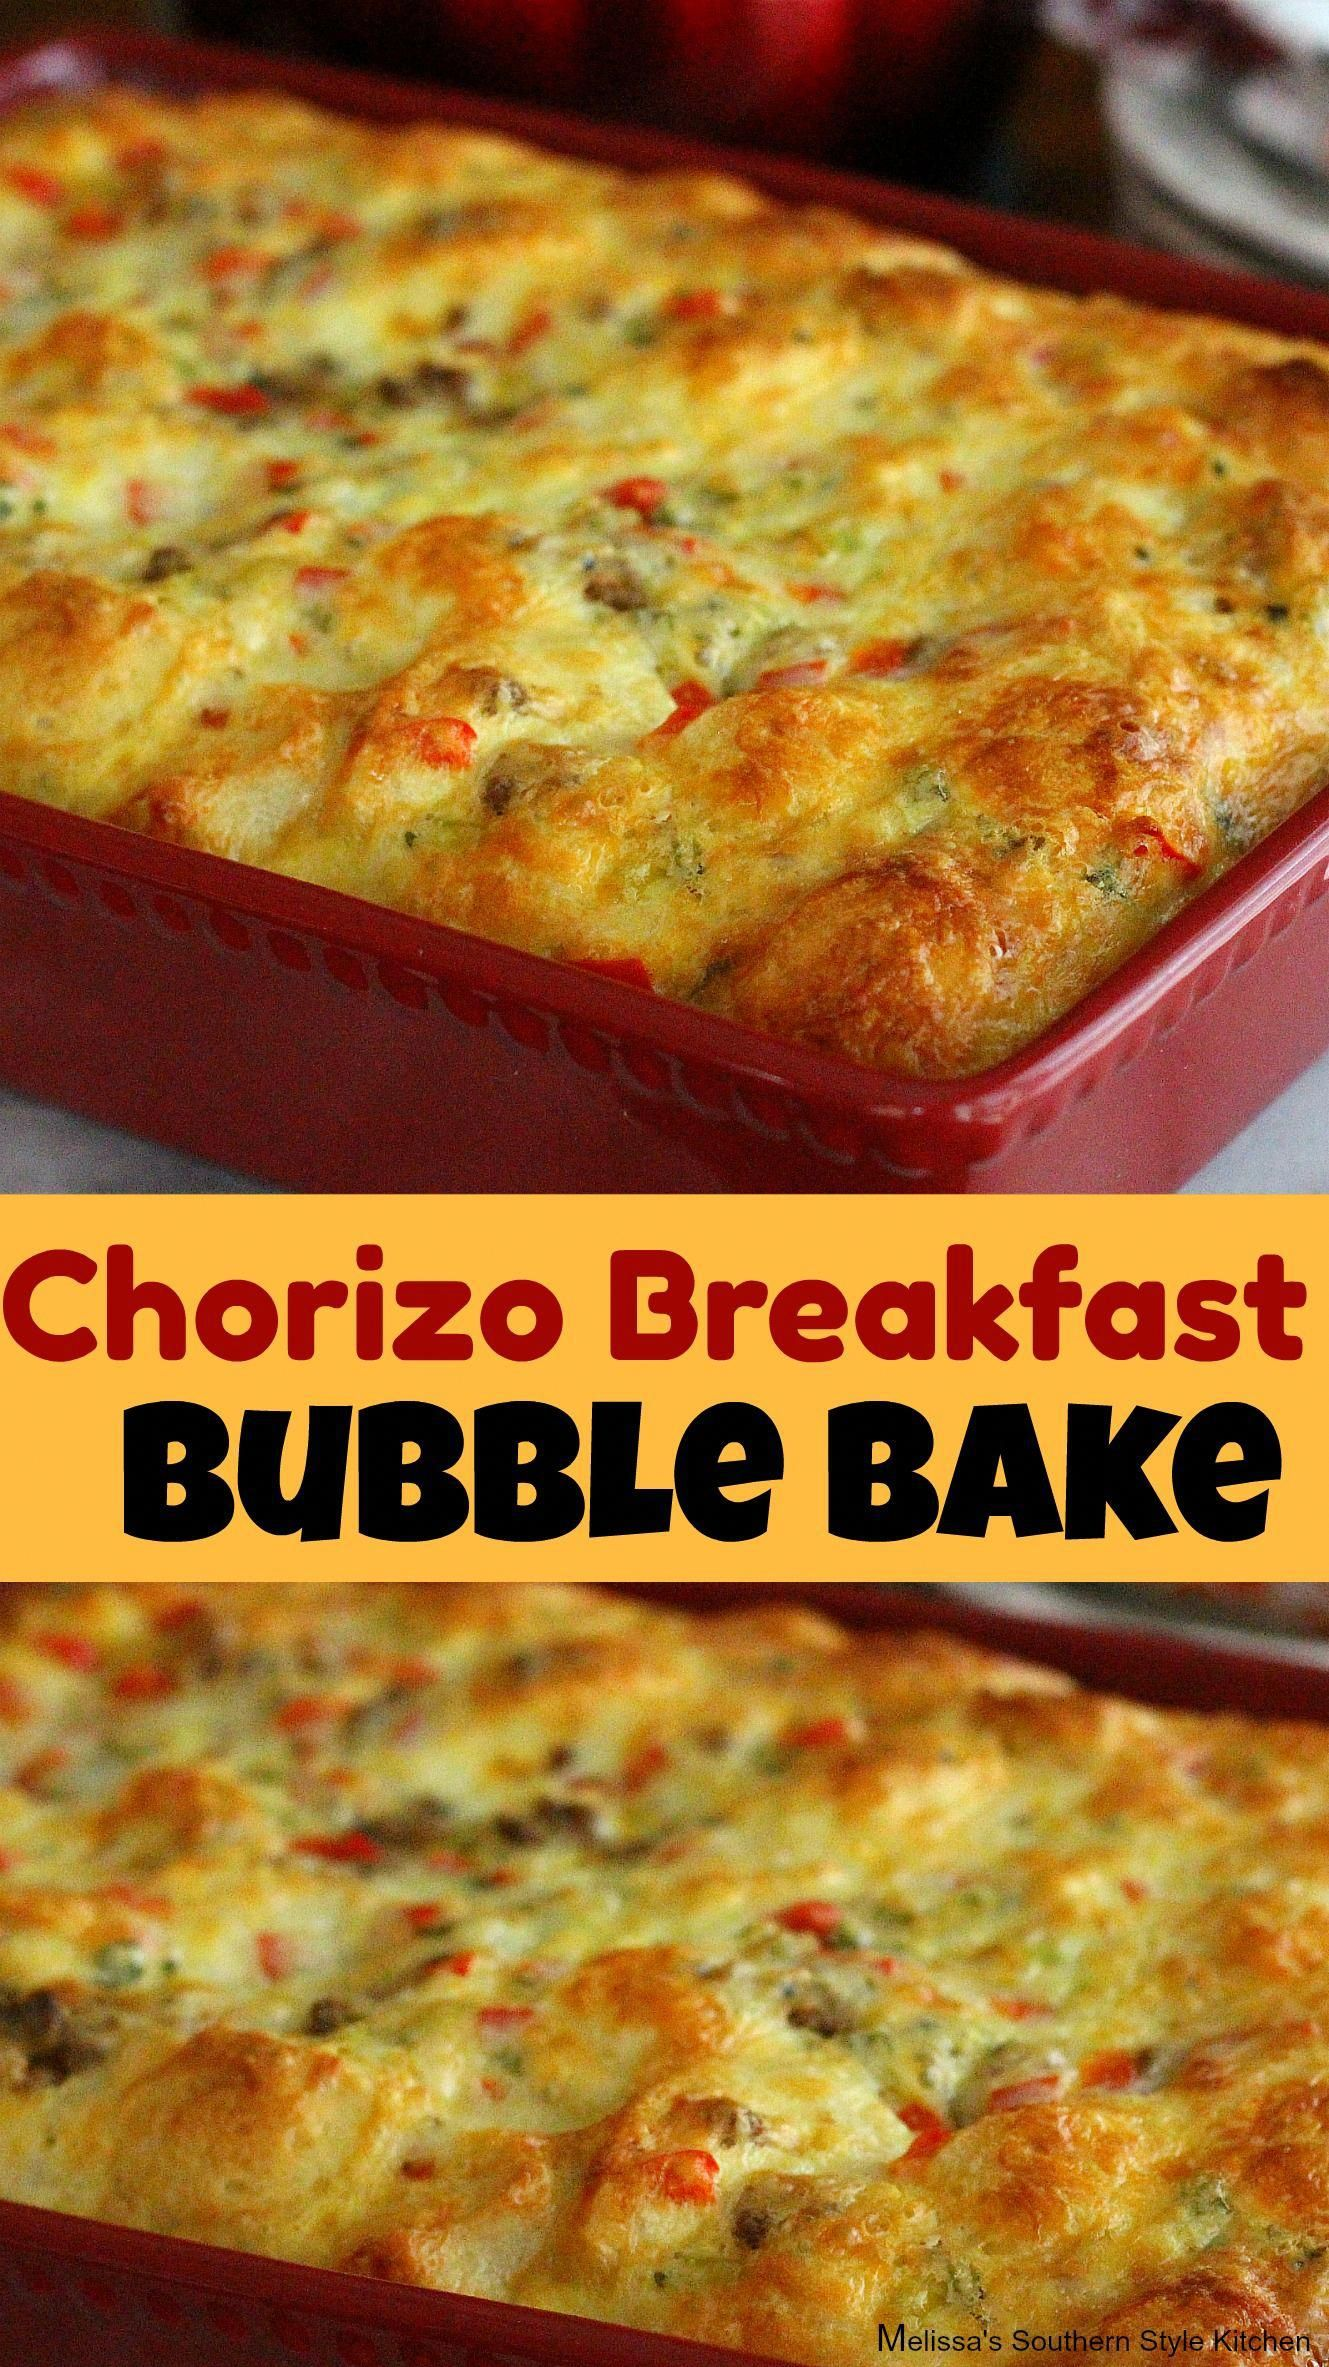 Chorizo Breakfast Bubble Bake #brunch #breakfast #makeahead #chorizo #holidaybrunchrecipes #christmas #easter #casseroles #recipes #food #cheesy #newyearseve #breakfastcasserolerecipes